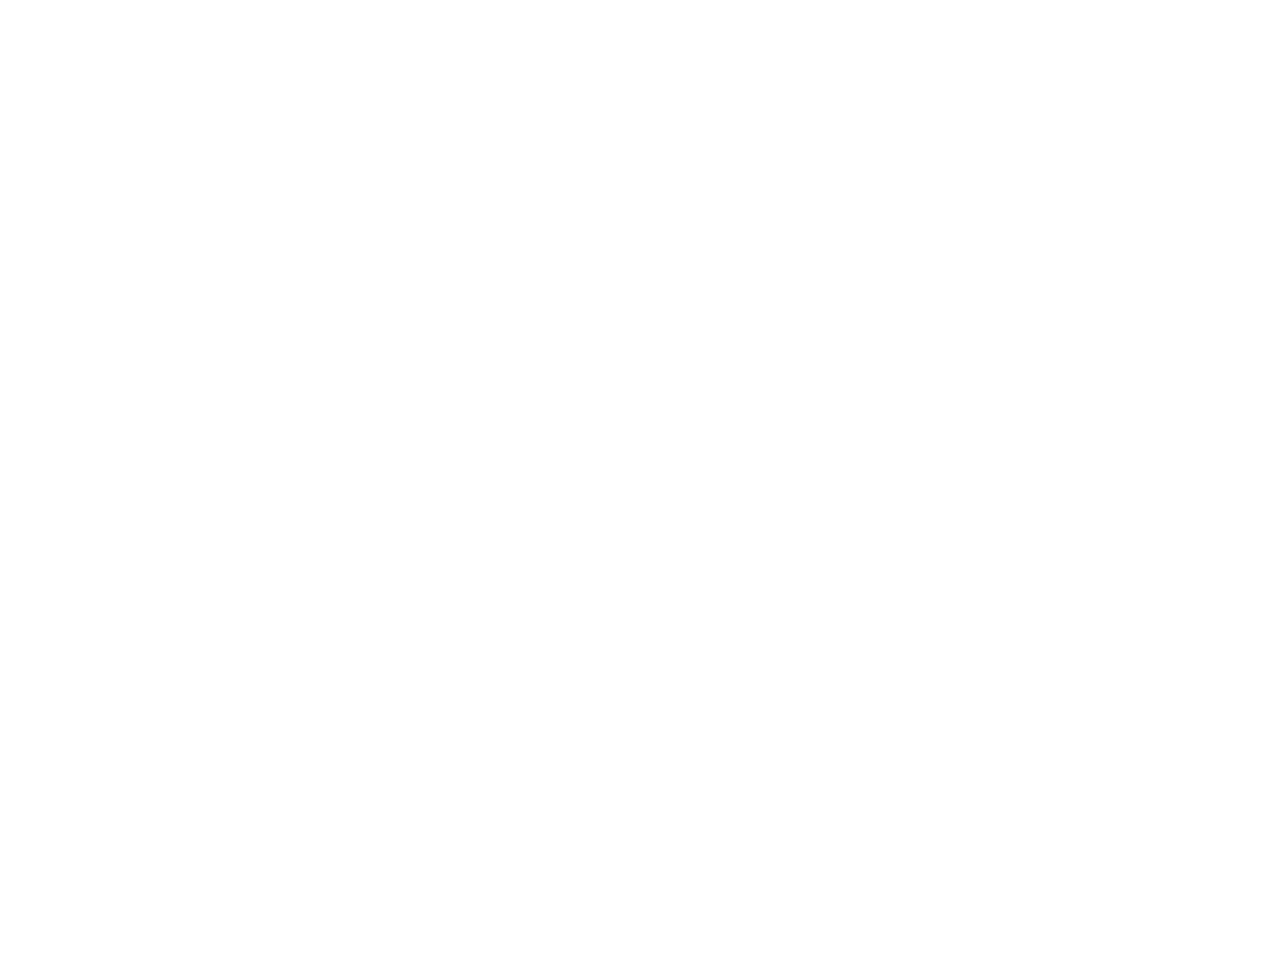 Parete con caratteri cinesi al tempio di Lingyin